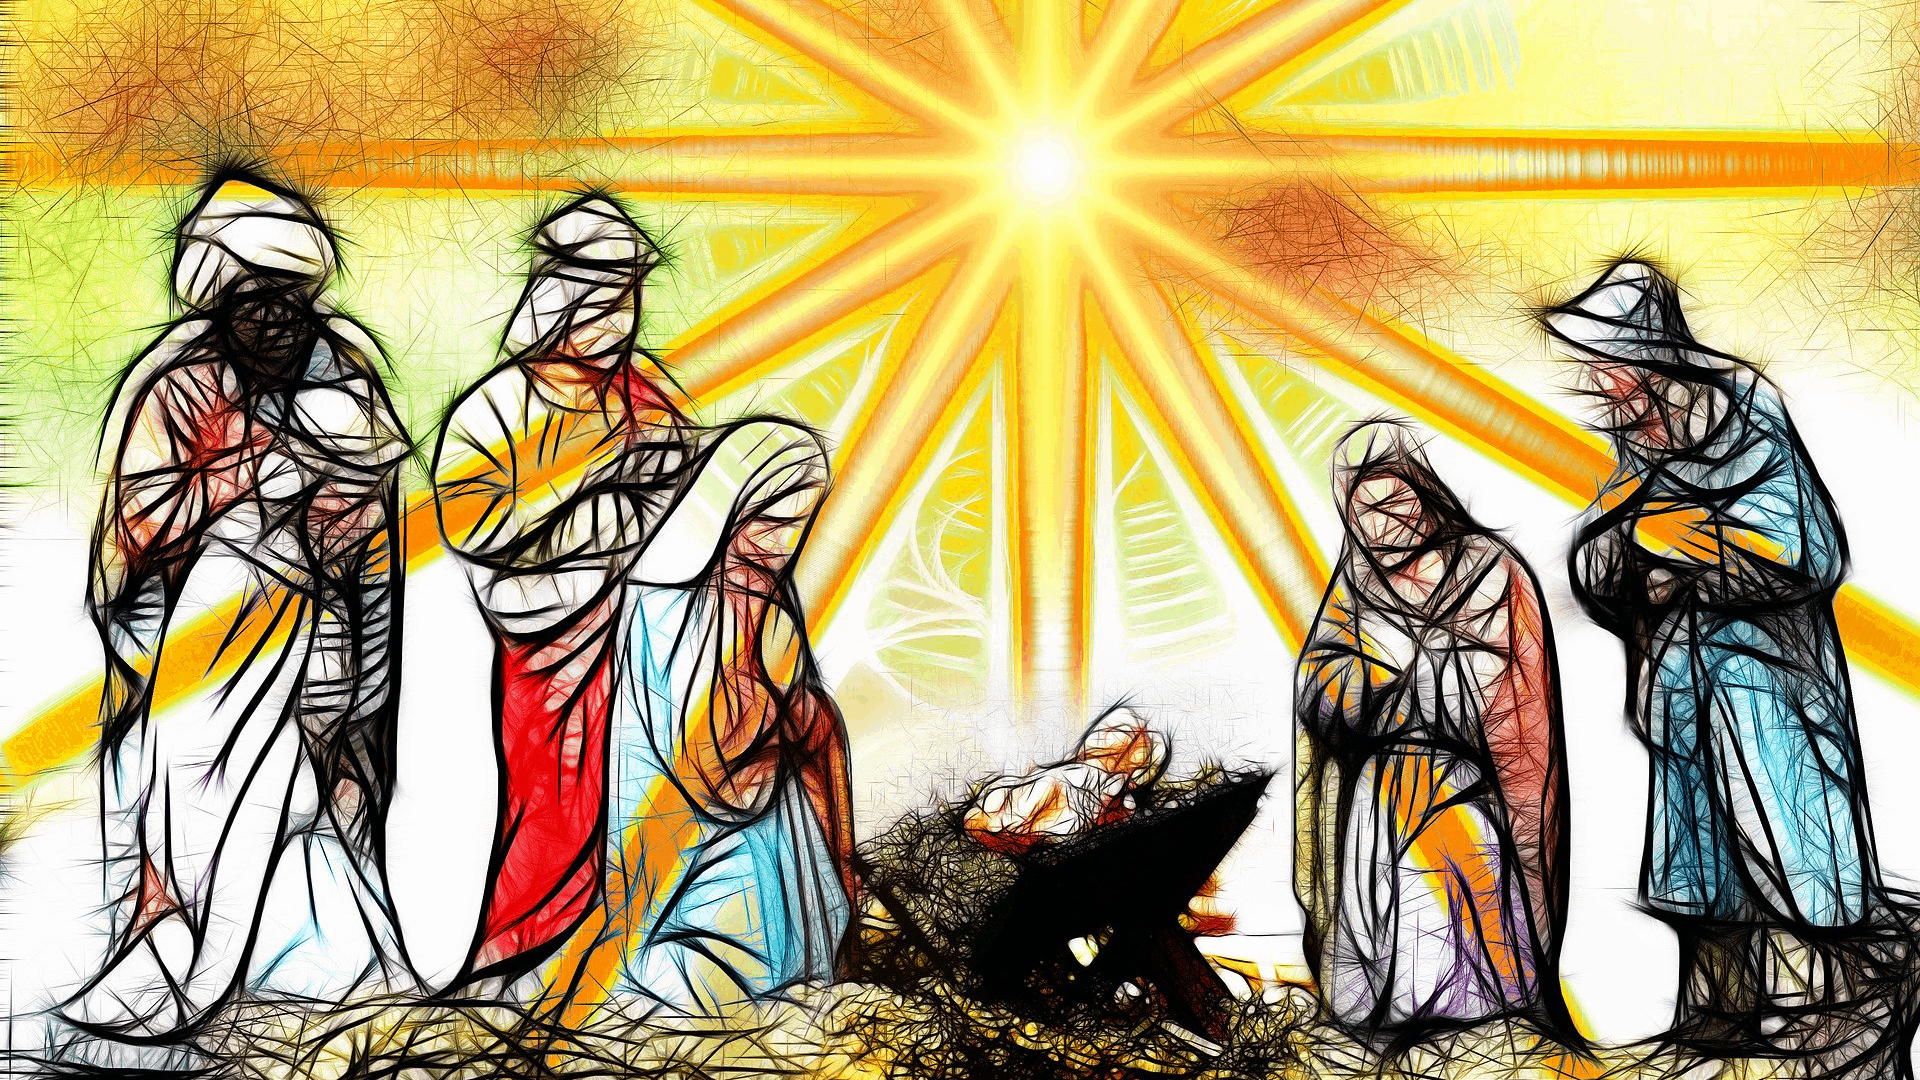 kerst-herders-kerststal-driekoningen-voerbak-olv-ter-nood-heiloo